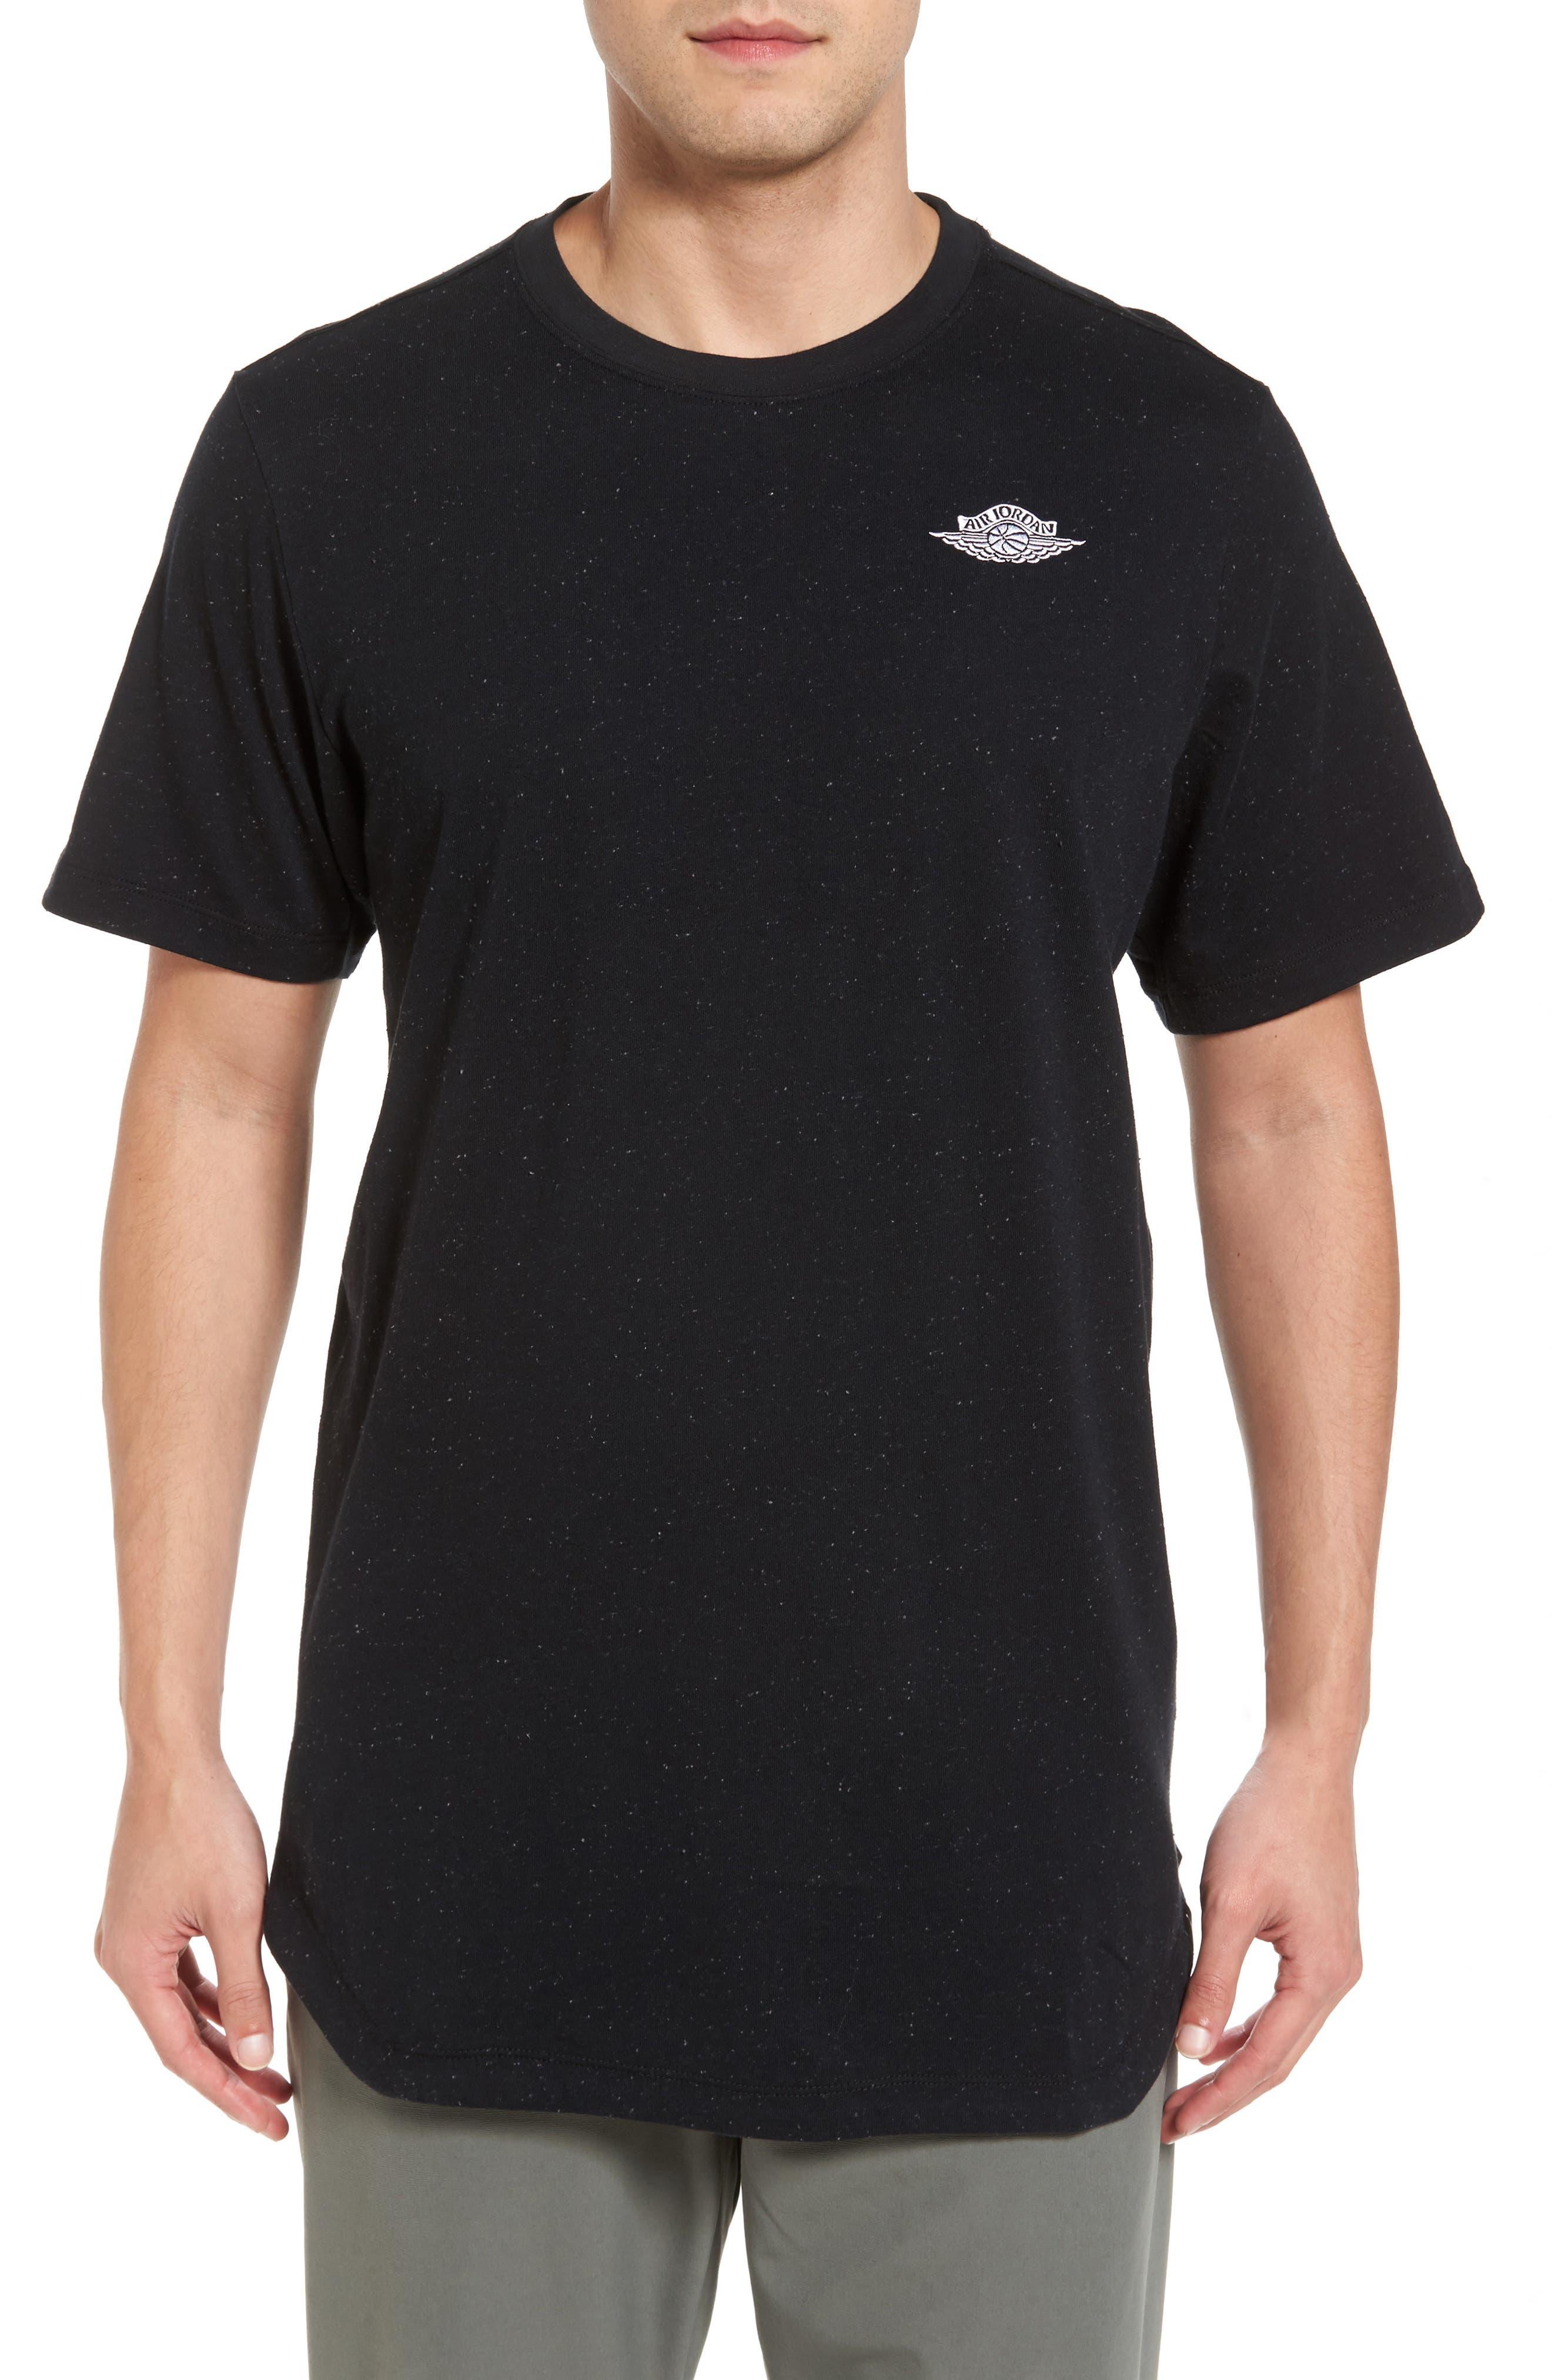 Future 2 T-Shirt,                             Main thumbnail 1, color,                             010